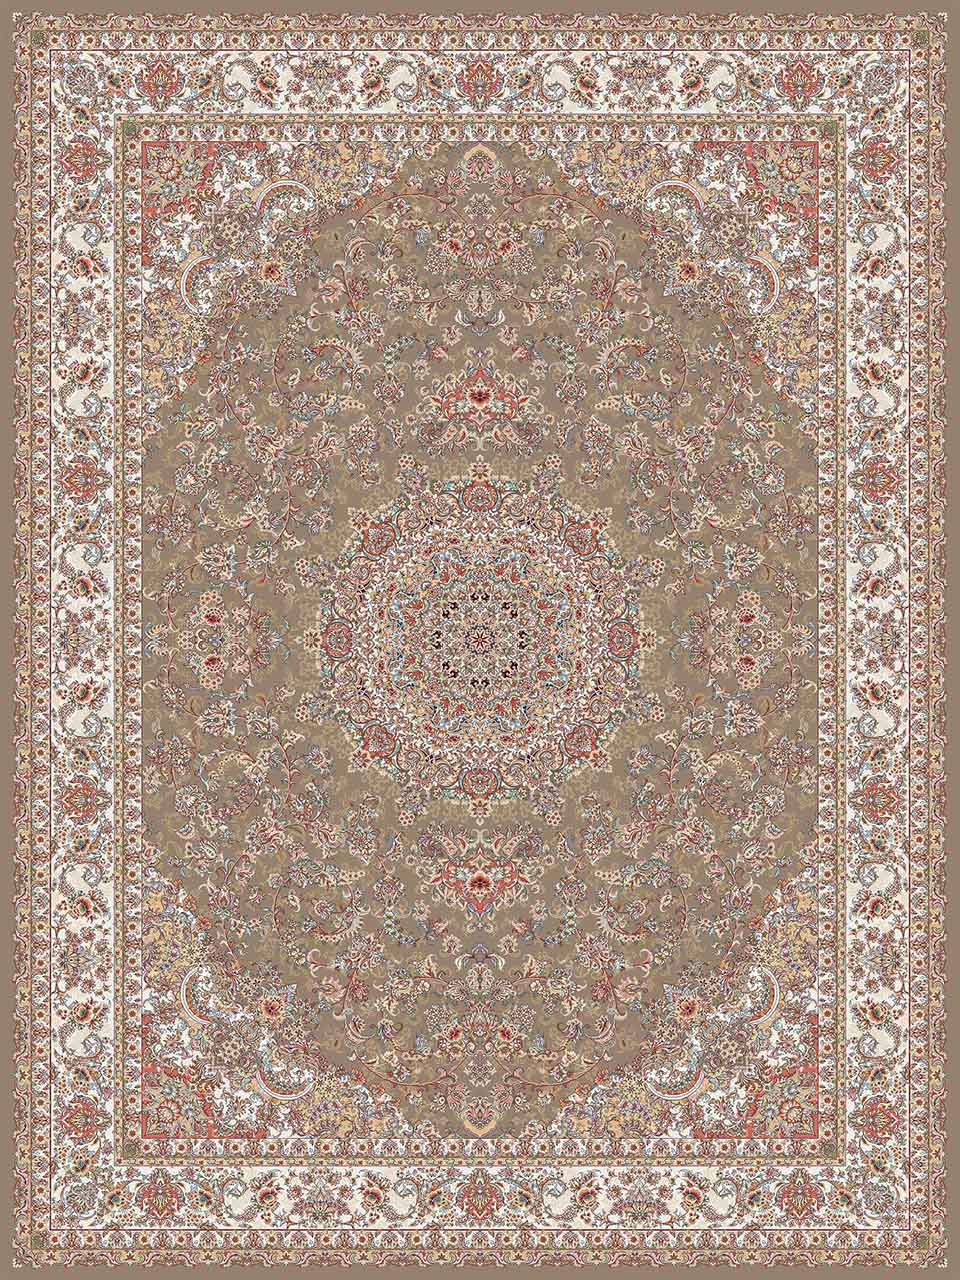 فرش (14003) اکریلیک - 8 رنگ - 700 شانه - گردويي - تراکم 2100